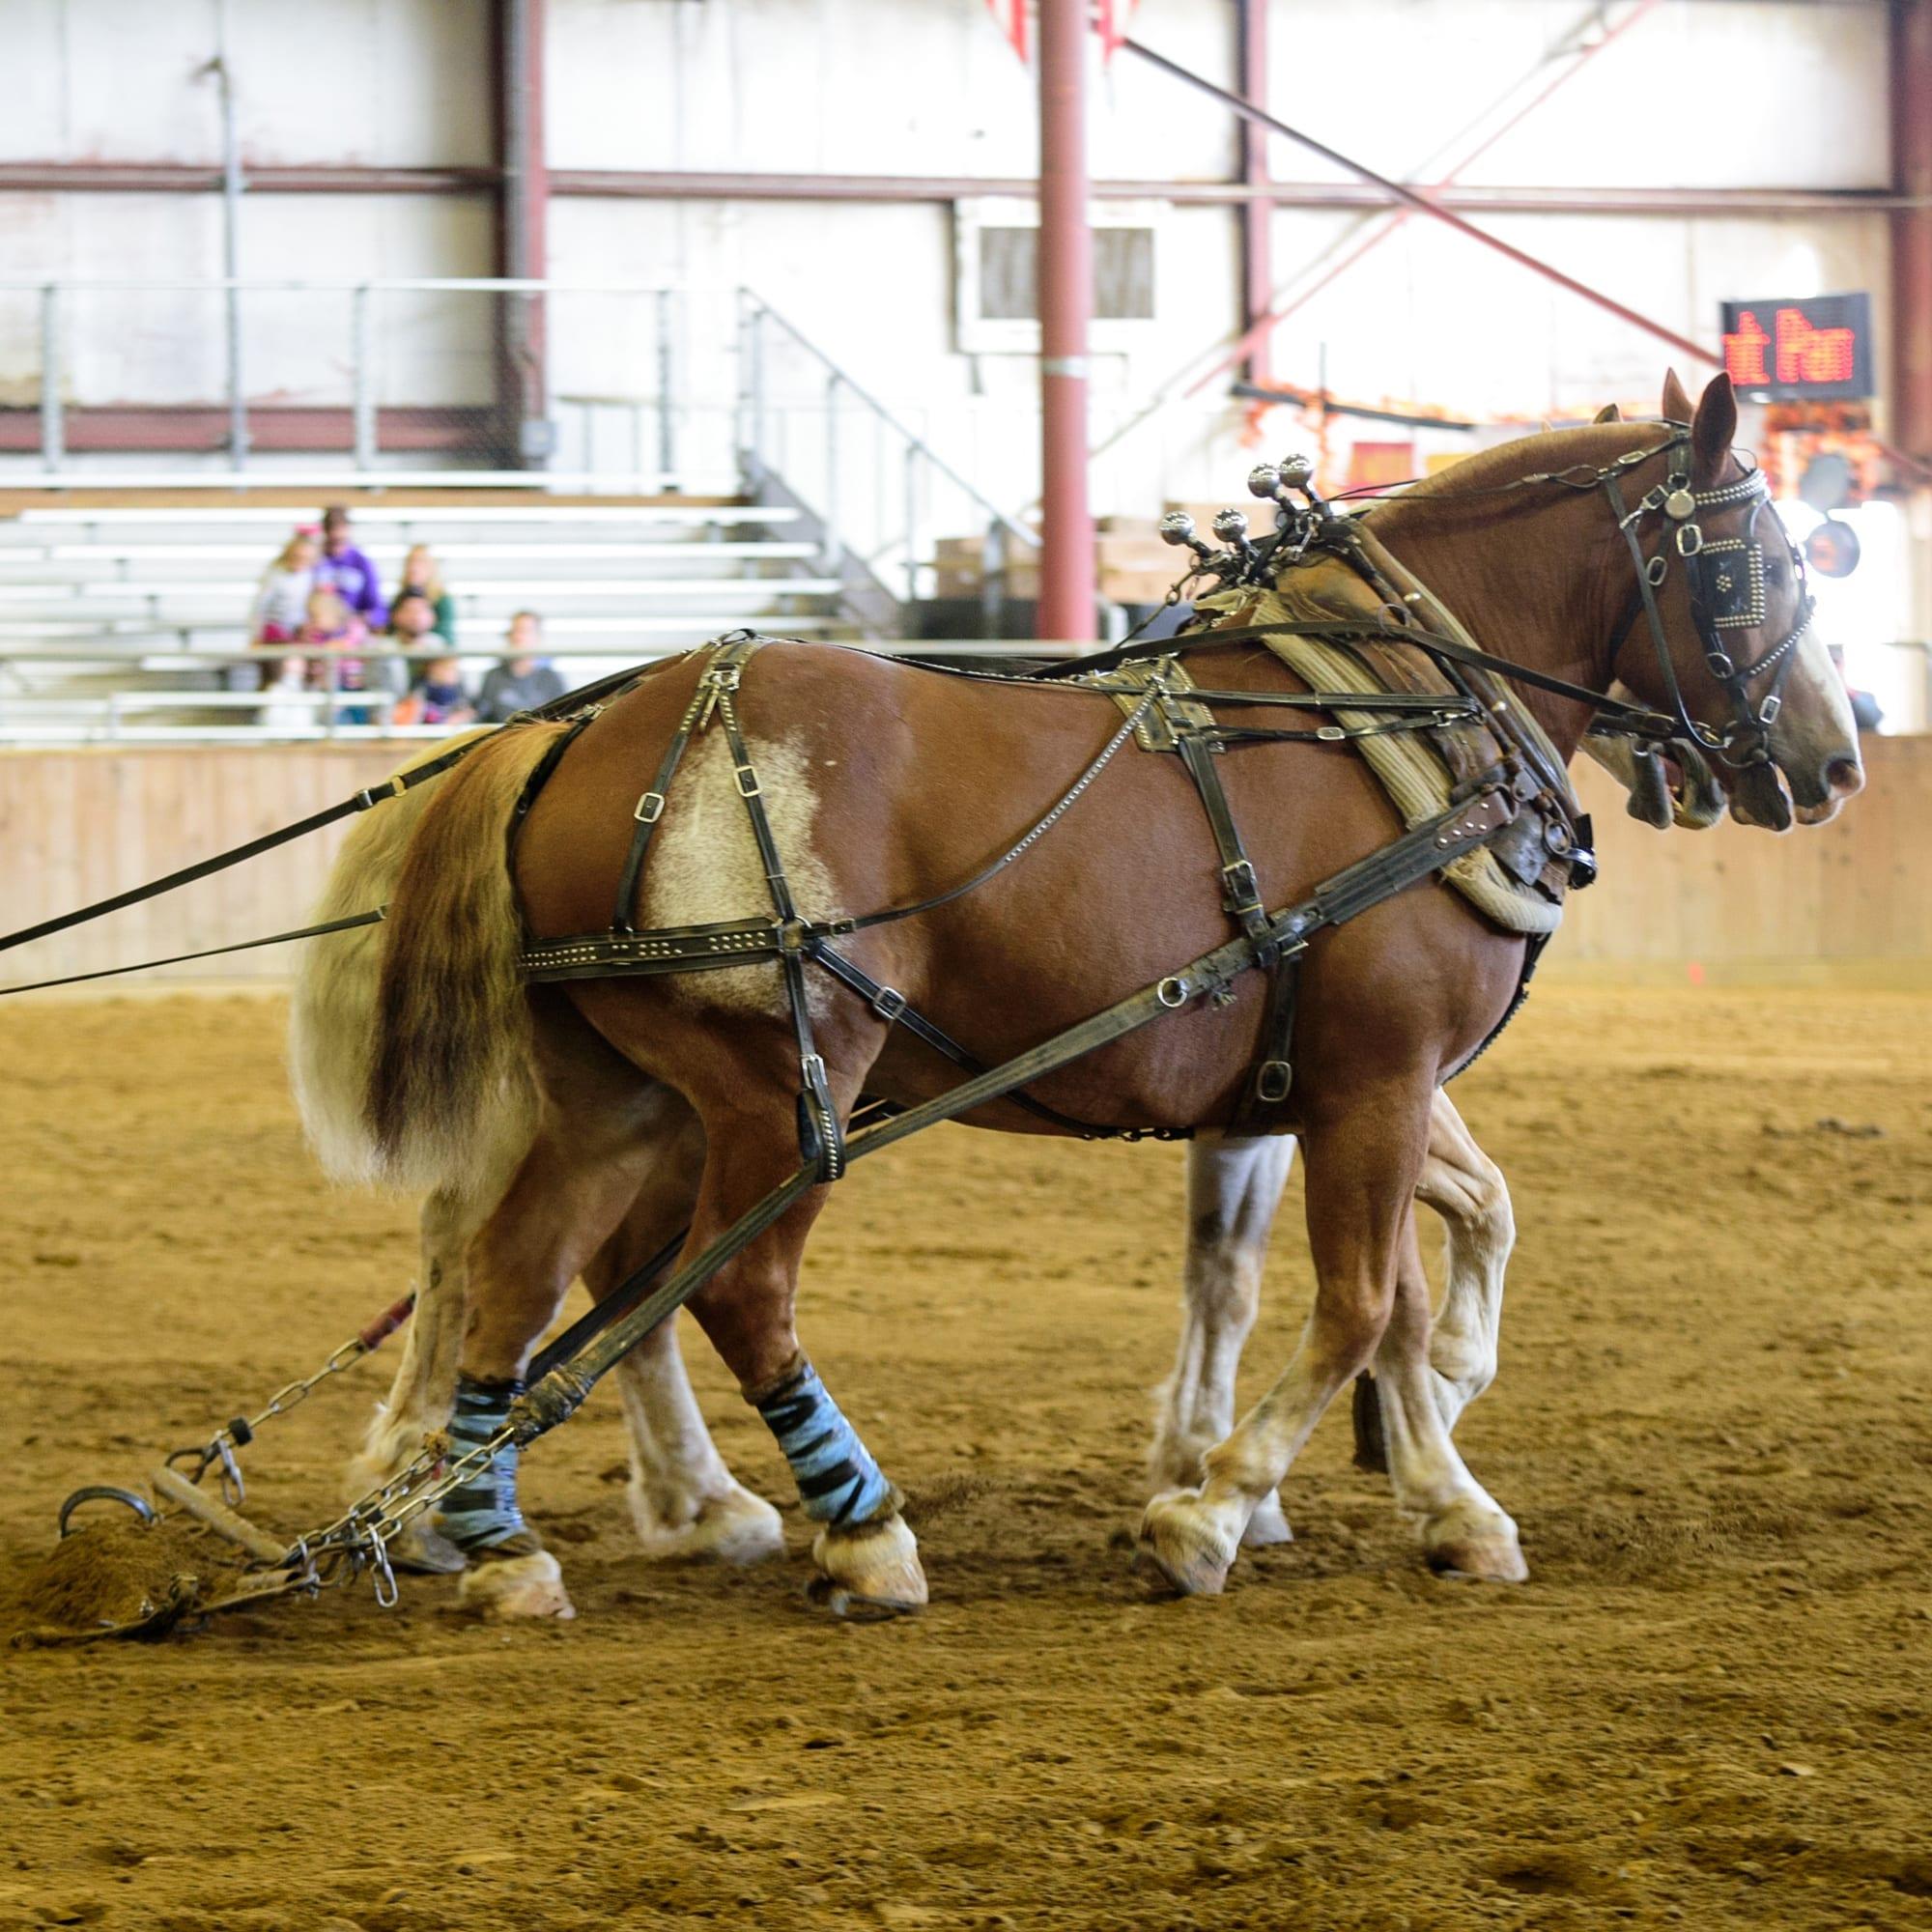 horses pulling heavy weight